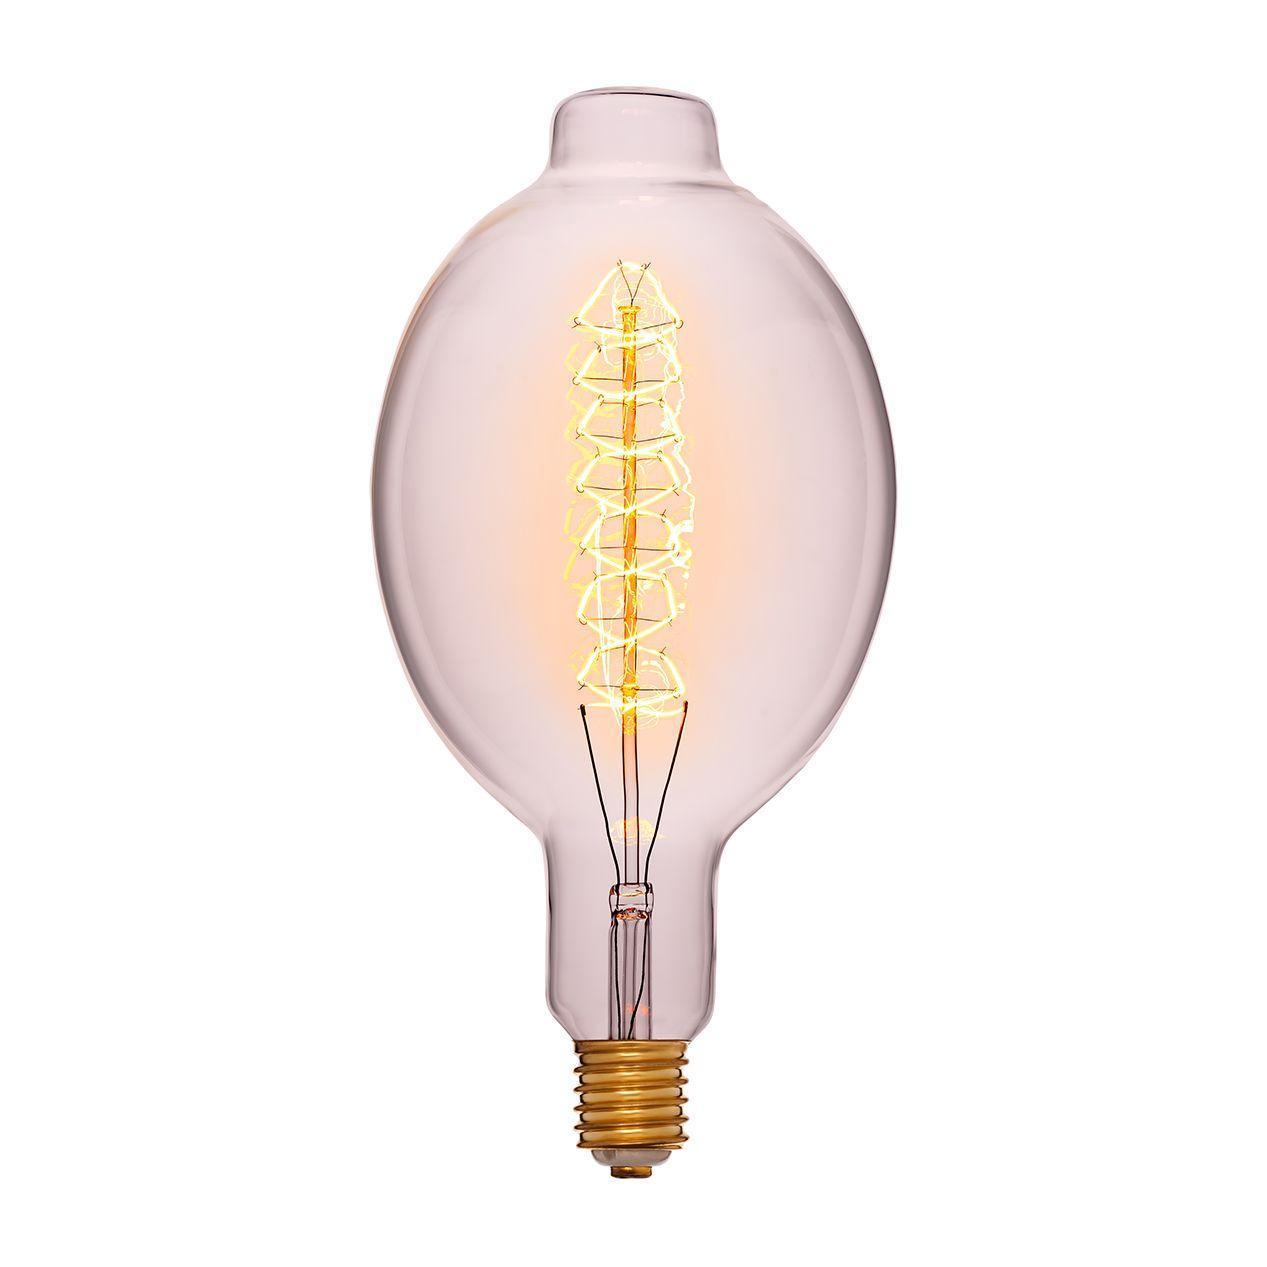 Лампа накаливания E40 95W прозрачная 053-822 лампа металогалогенная 04129 e40 400w 4000к труба прозрачная mh to 400 4000 e40